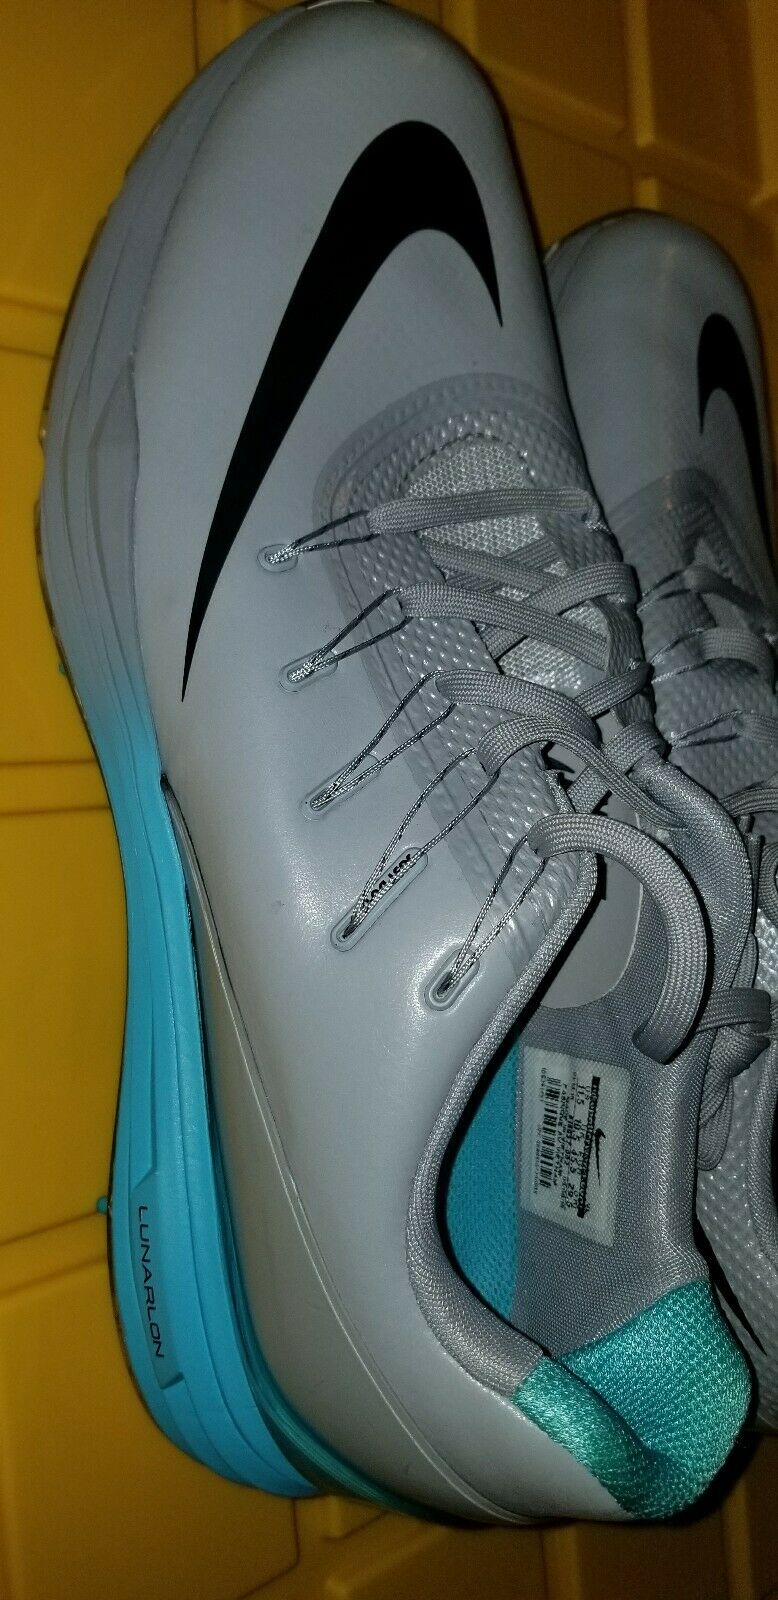 consultor Cabaña ¿Cómo  Nike Lunar Control 4 Mens Golf Shoes Wolf Grey Beta Blue 819037 002 McIlroy  11.5 for sale online | eBay